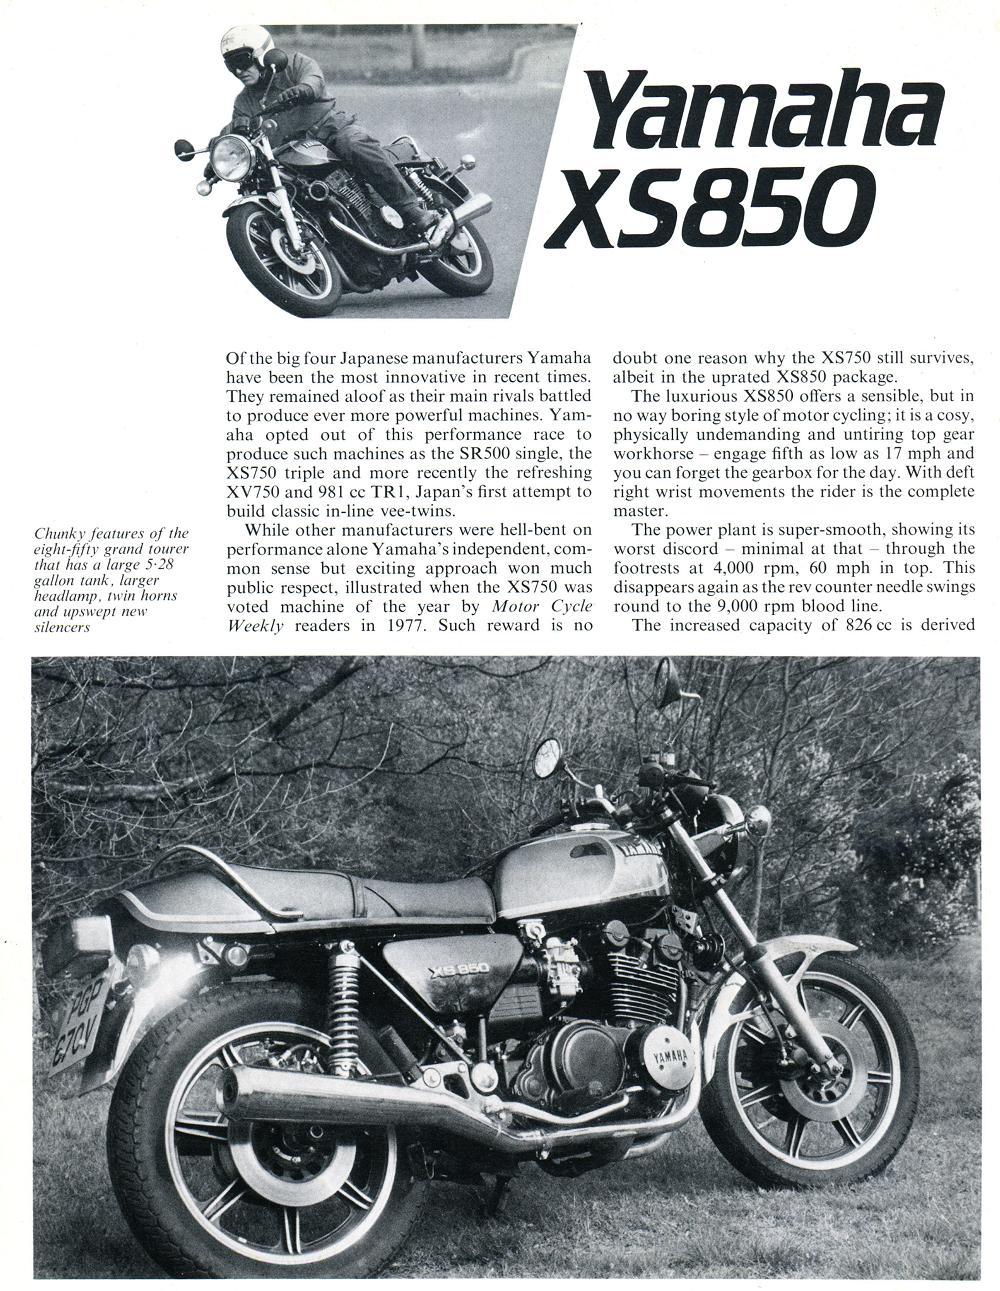 1982 Yamaha XS850 road test. 1.jpg